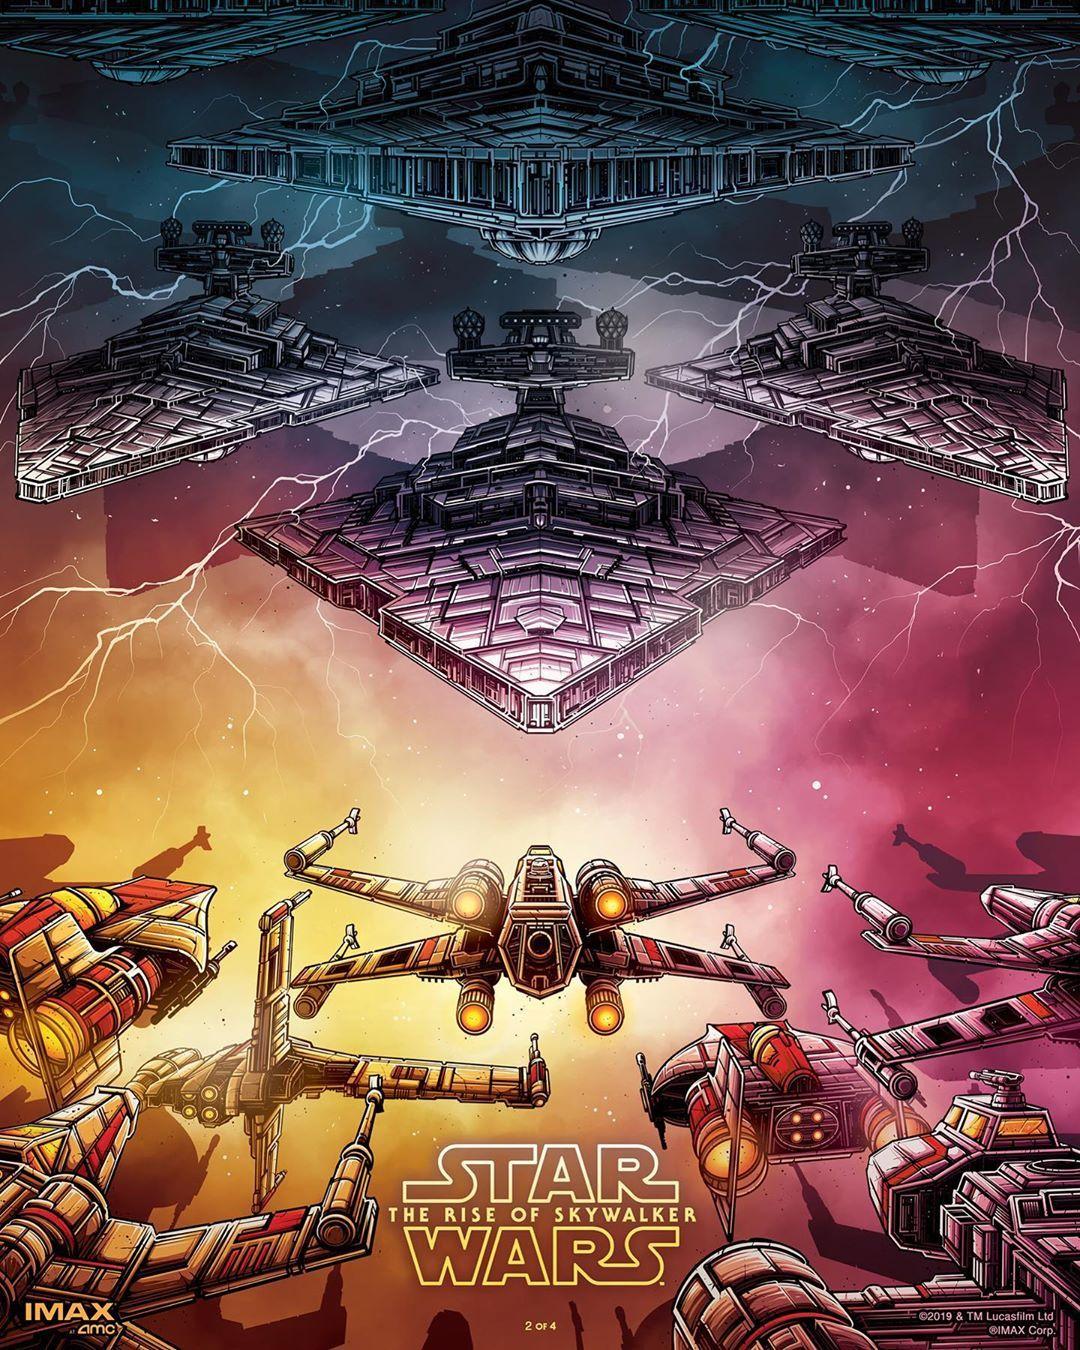 Star Wars The Rise Of Skywalker Star Wars Poster Star Wars Wallpaper Dan Mumford